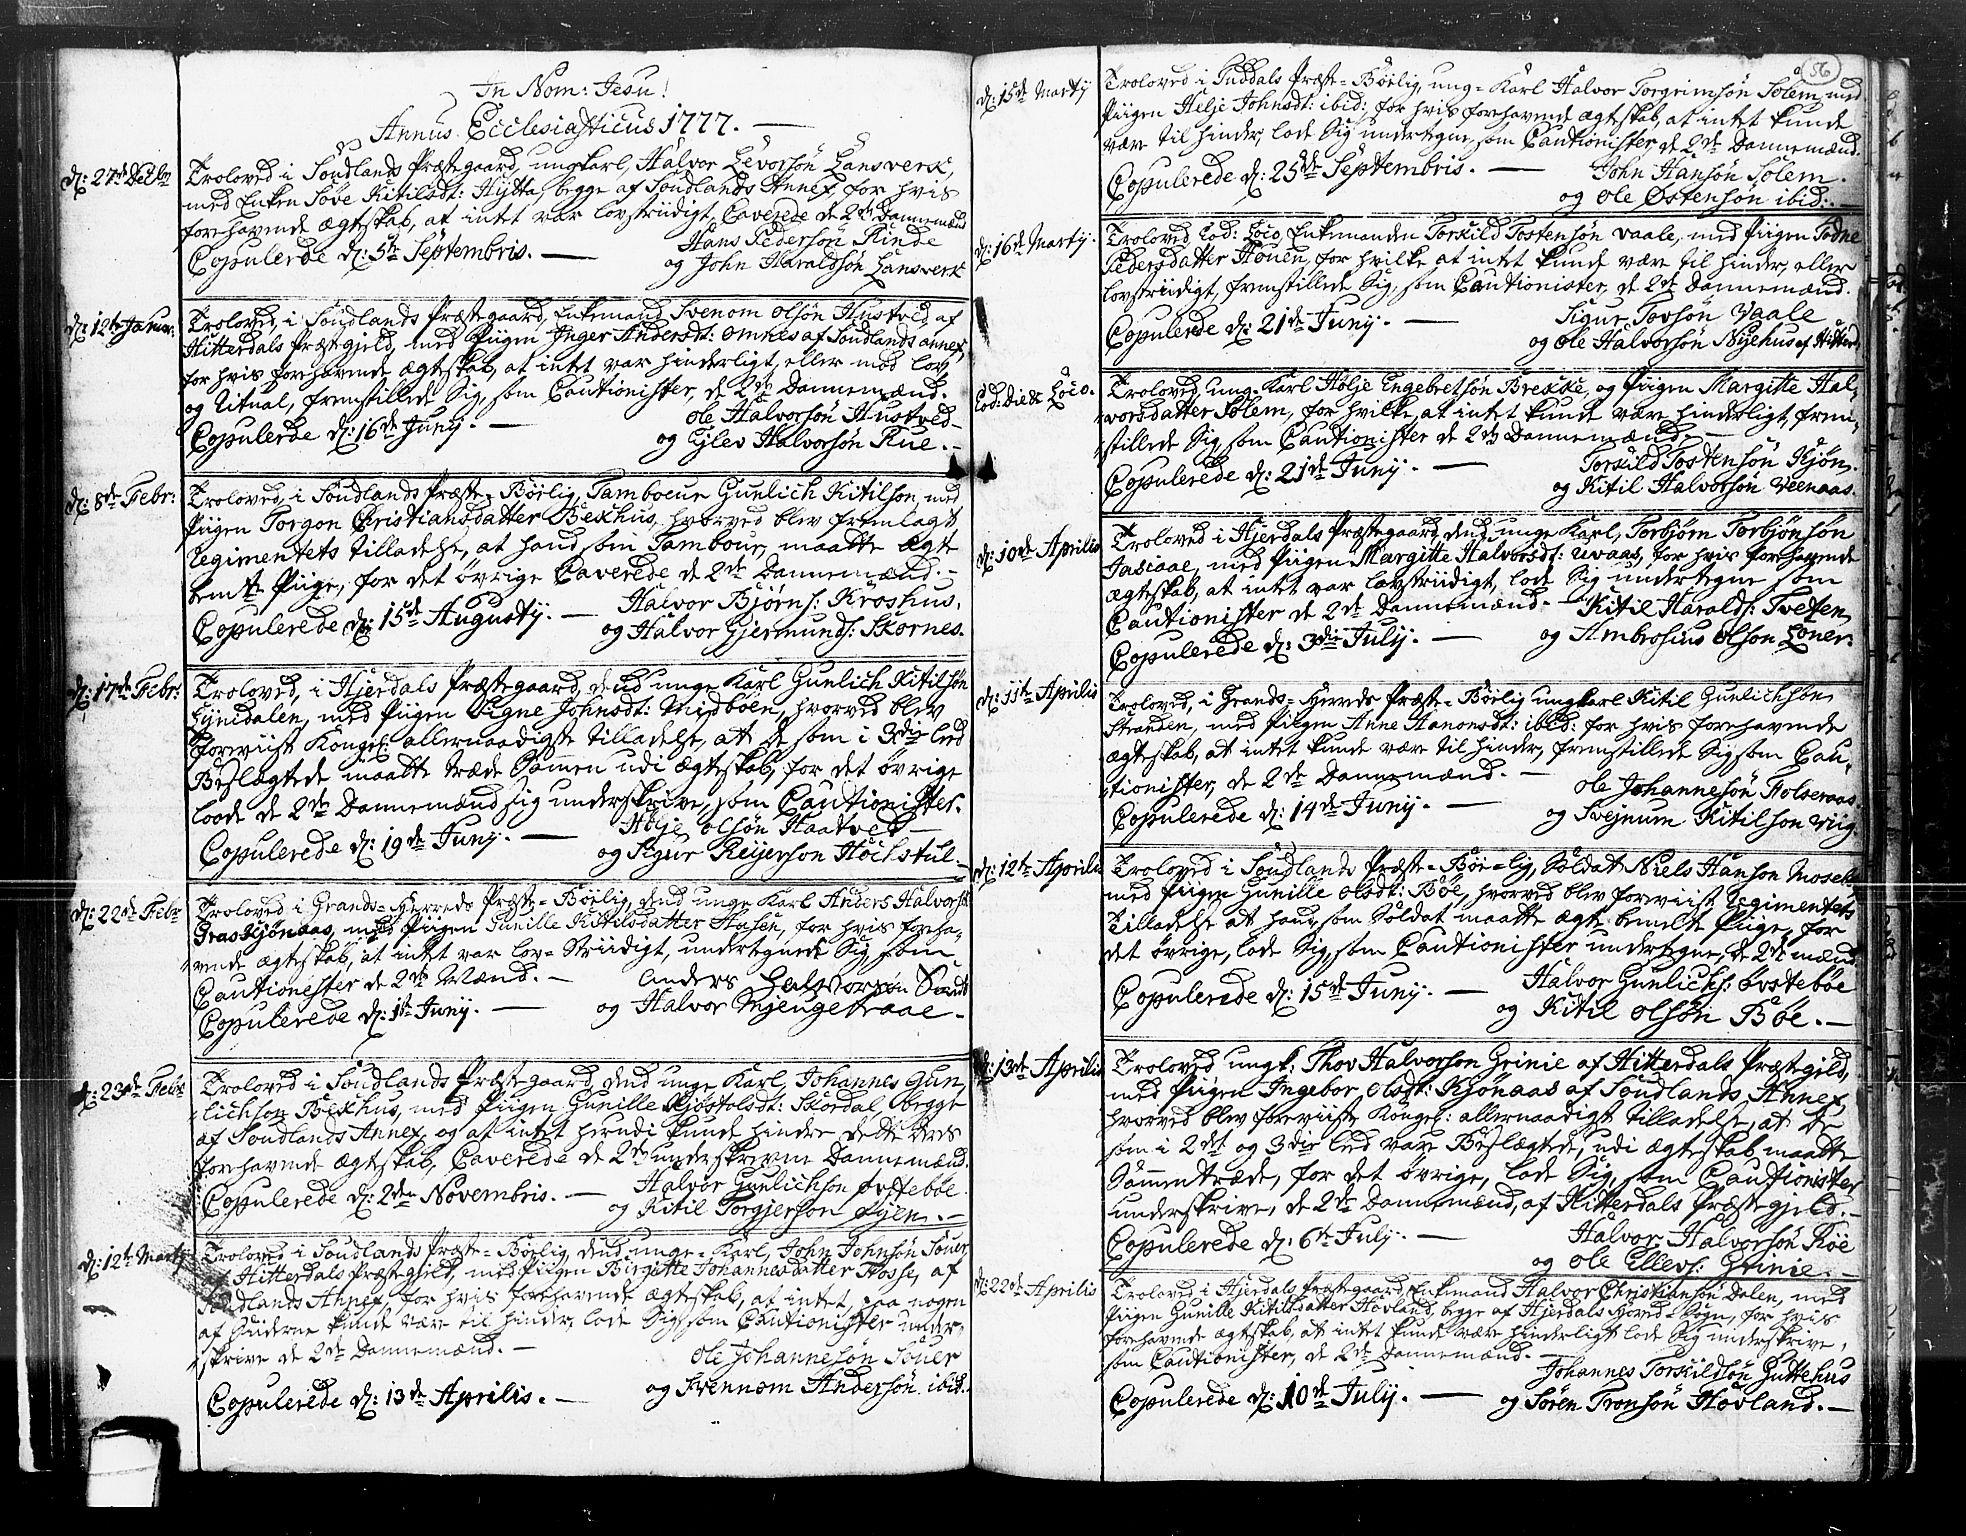 SAKO, Hjartdal kirkebøker, F/Fa/L0004: Ministerialbok nr. I 4, 1727-1795, s. 56